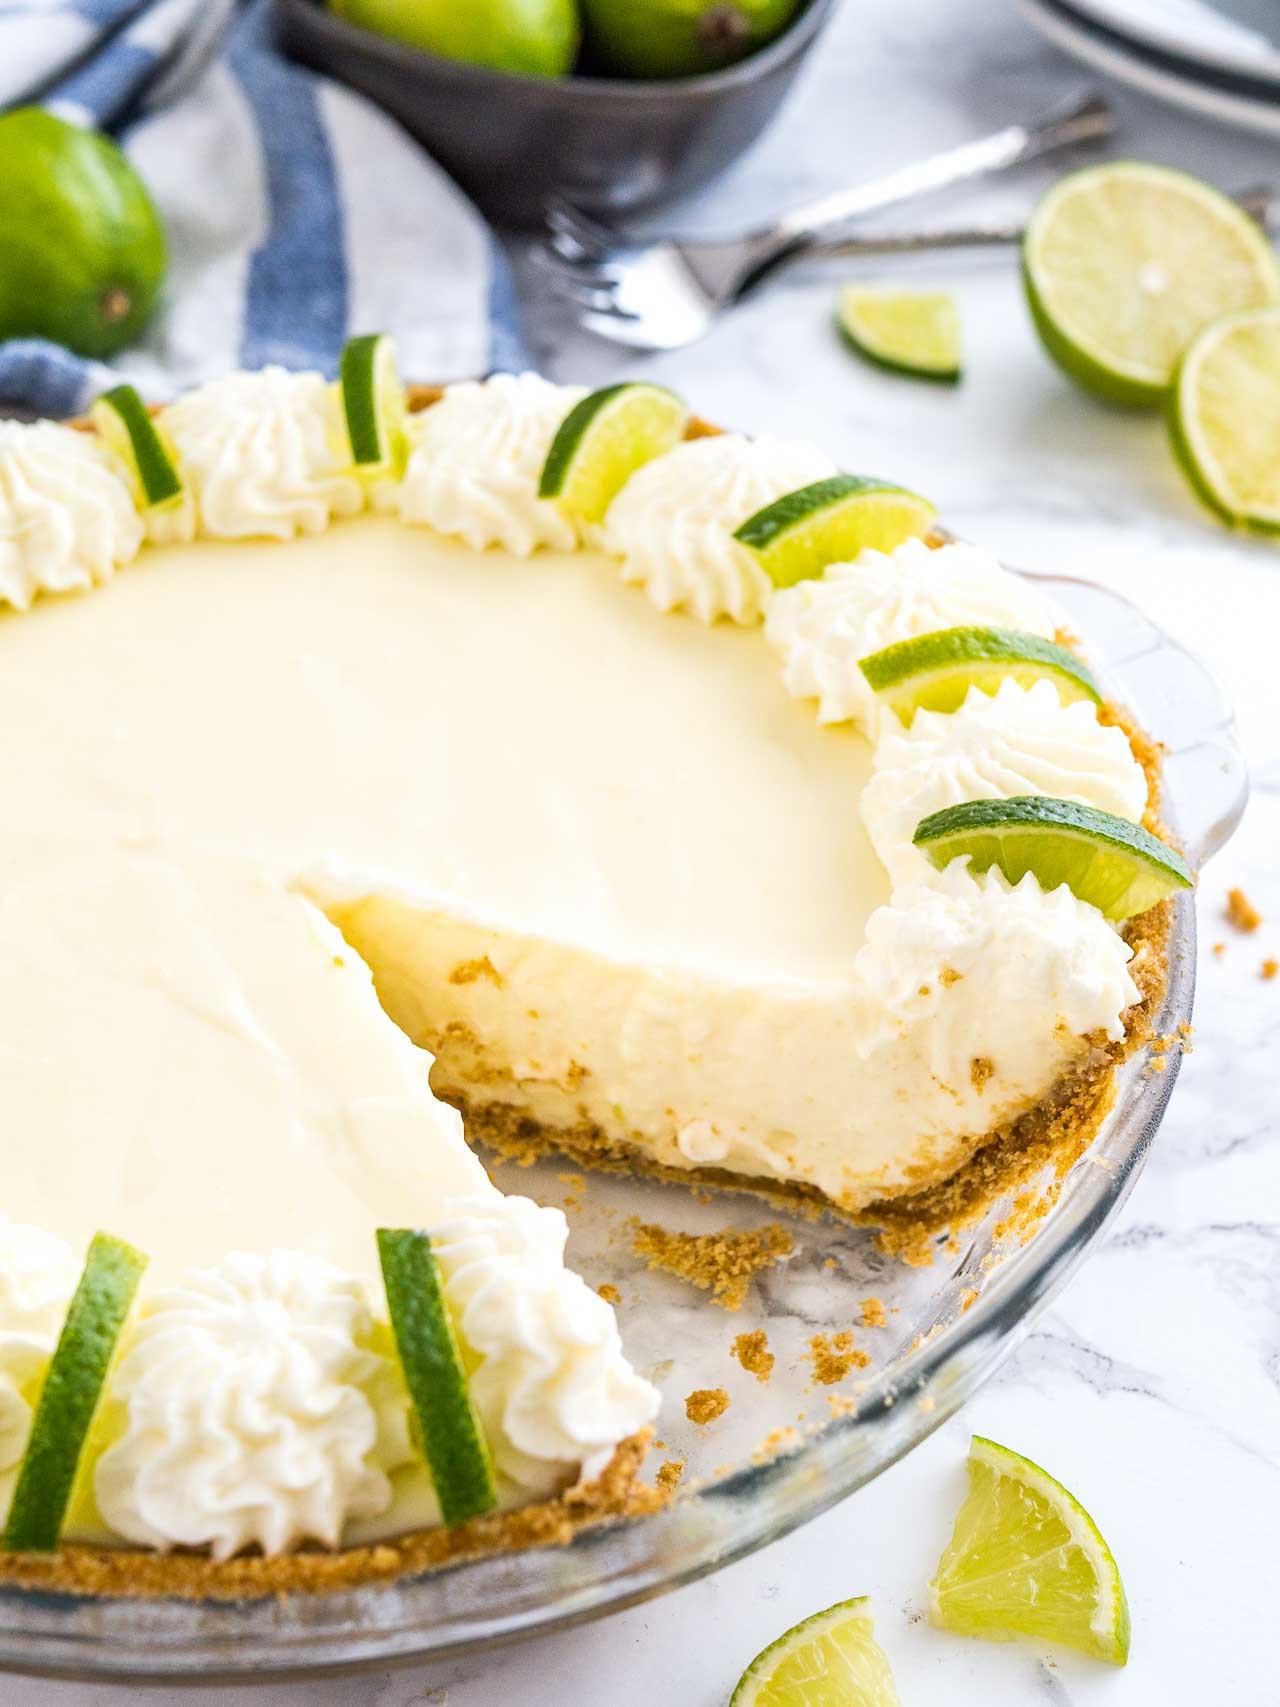 Lime Dessert Recipes  lime dessert recipes